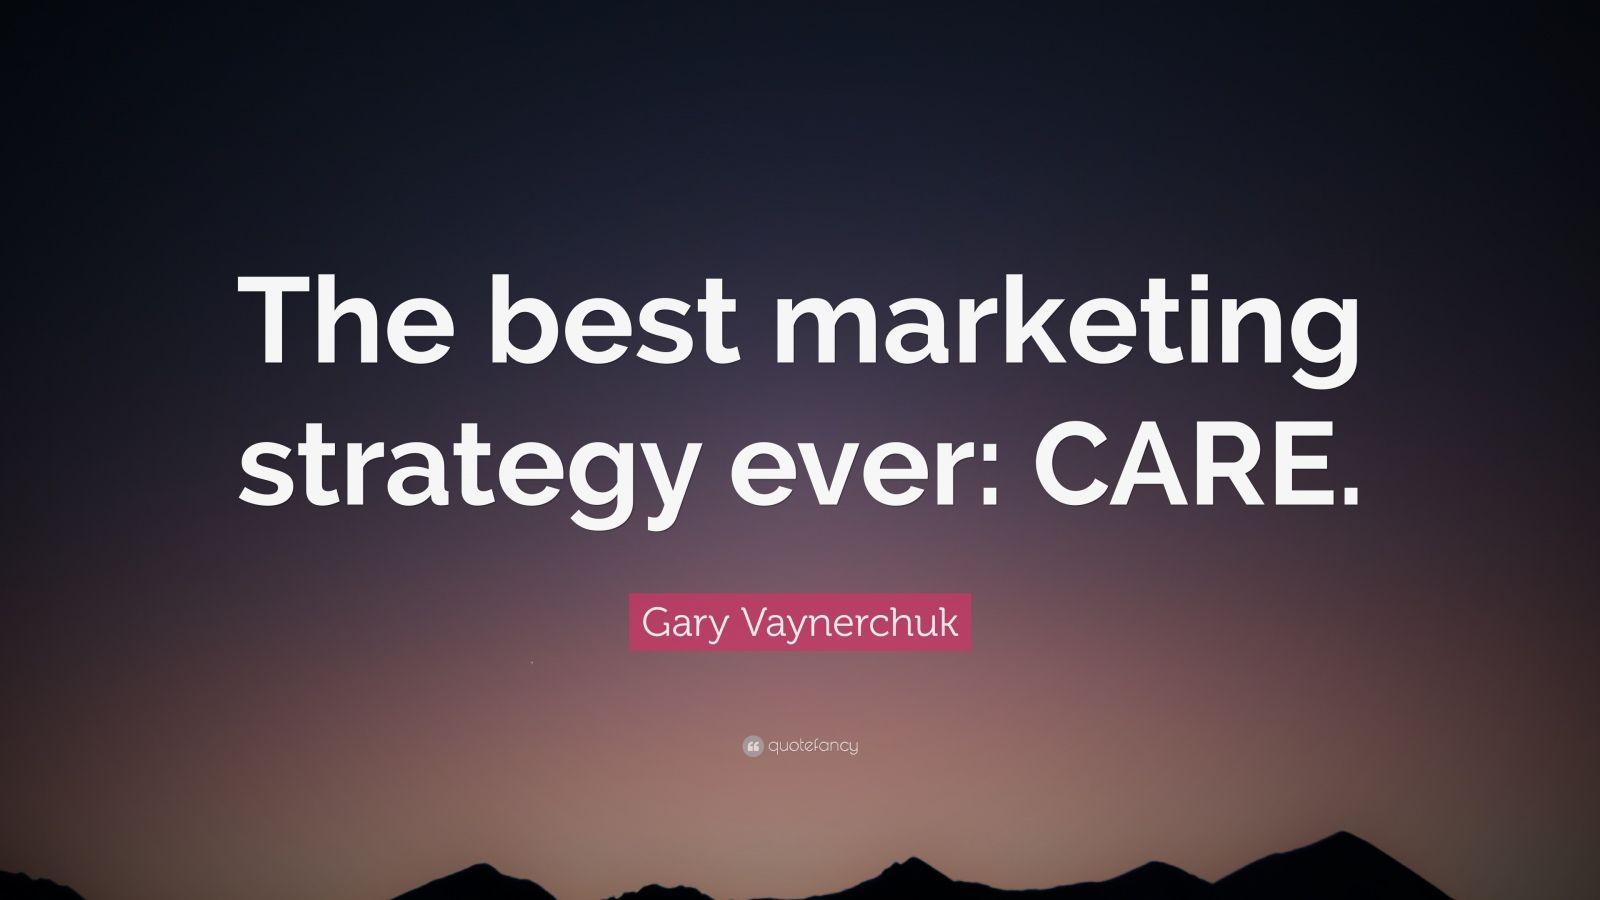 Gary Vaynerchuk Quotes Wallpaper Gary Vaynerchuk Quote The Best Marketing Strategy Ever